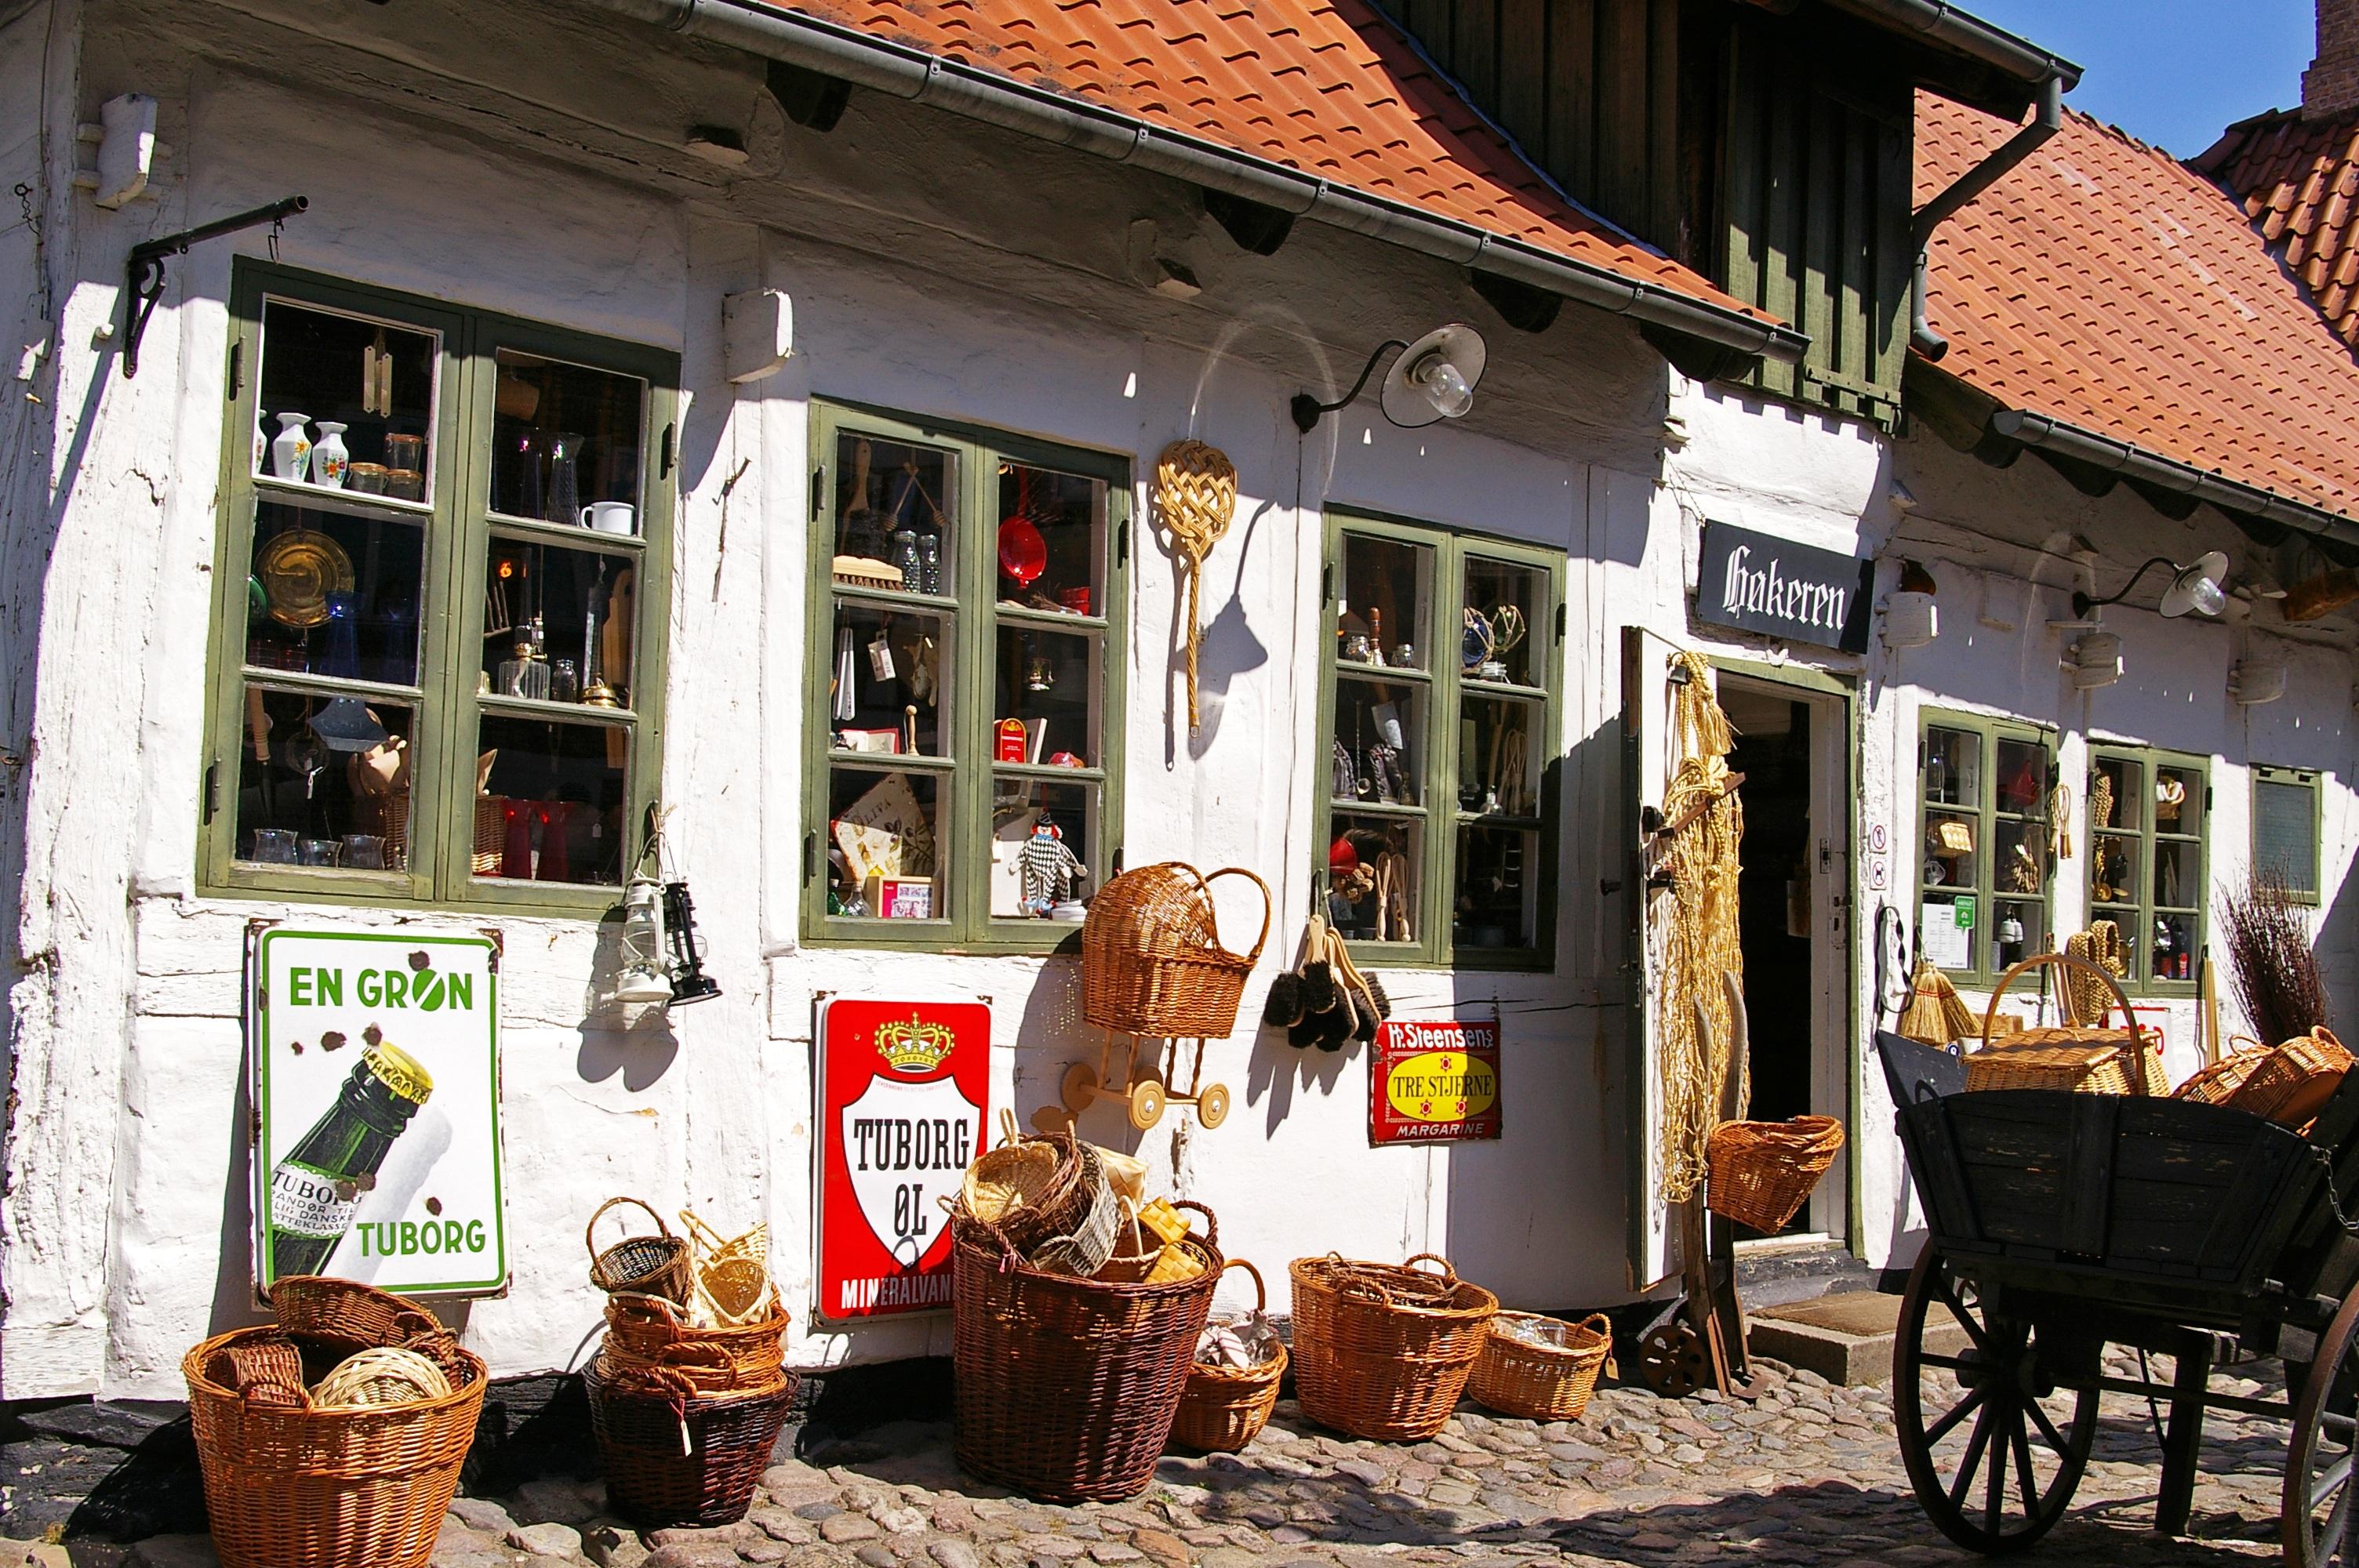 Free Images : architecture, antique, window, building, restaurant ...